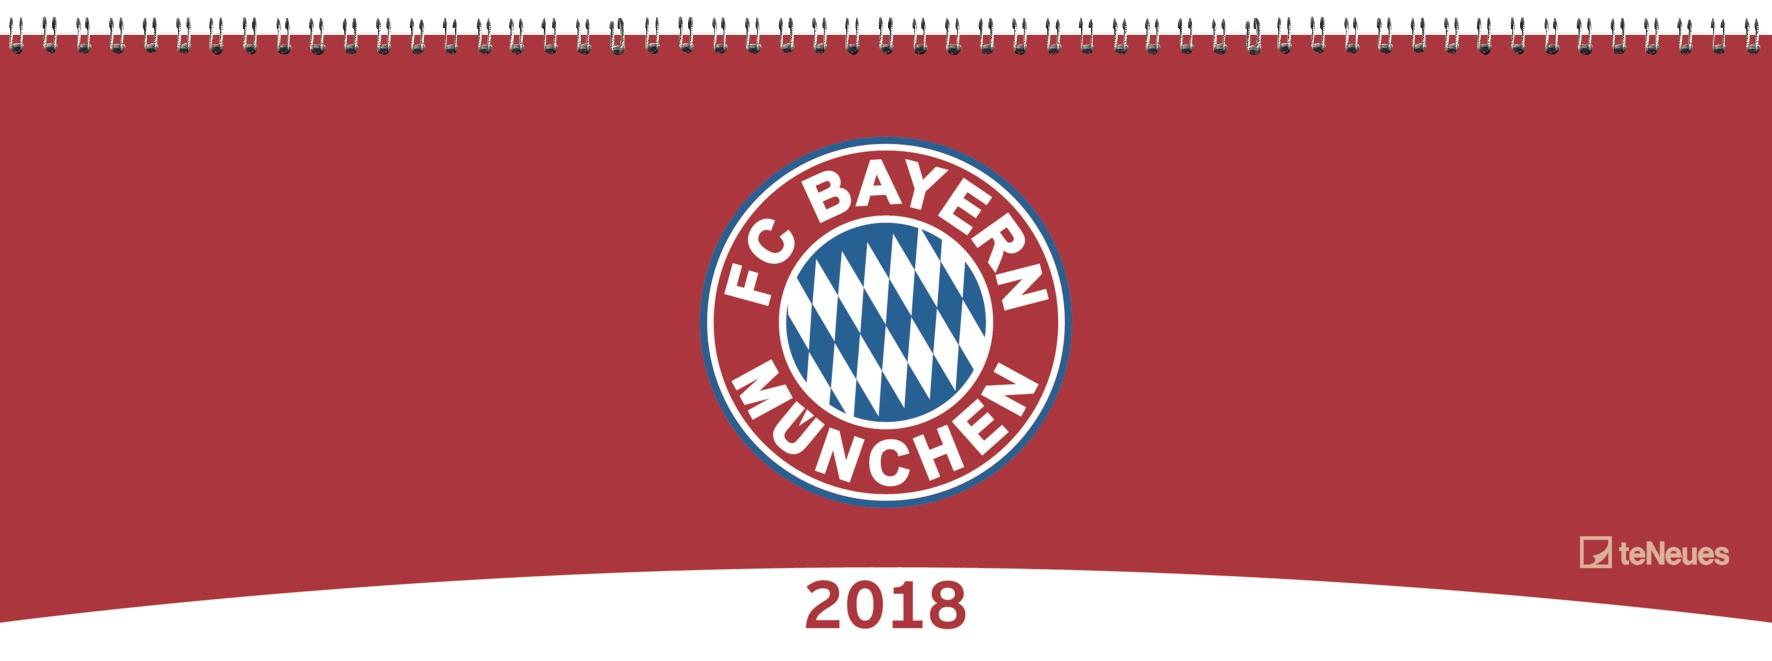 kalender 2018 fc bayern m nchen tischquerkalender 2018 fc bayern m nchen kalen ebay. Black Bedroom Furniture Sets. Home Design Ideas